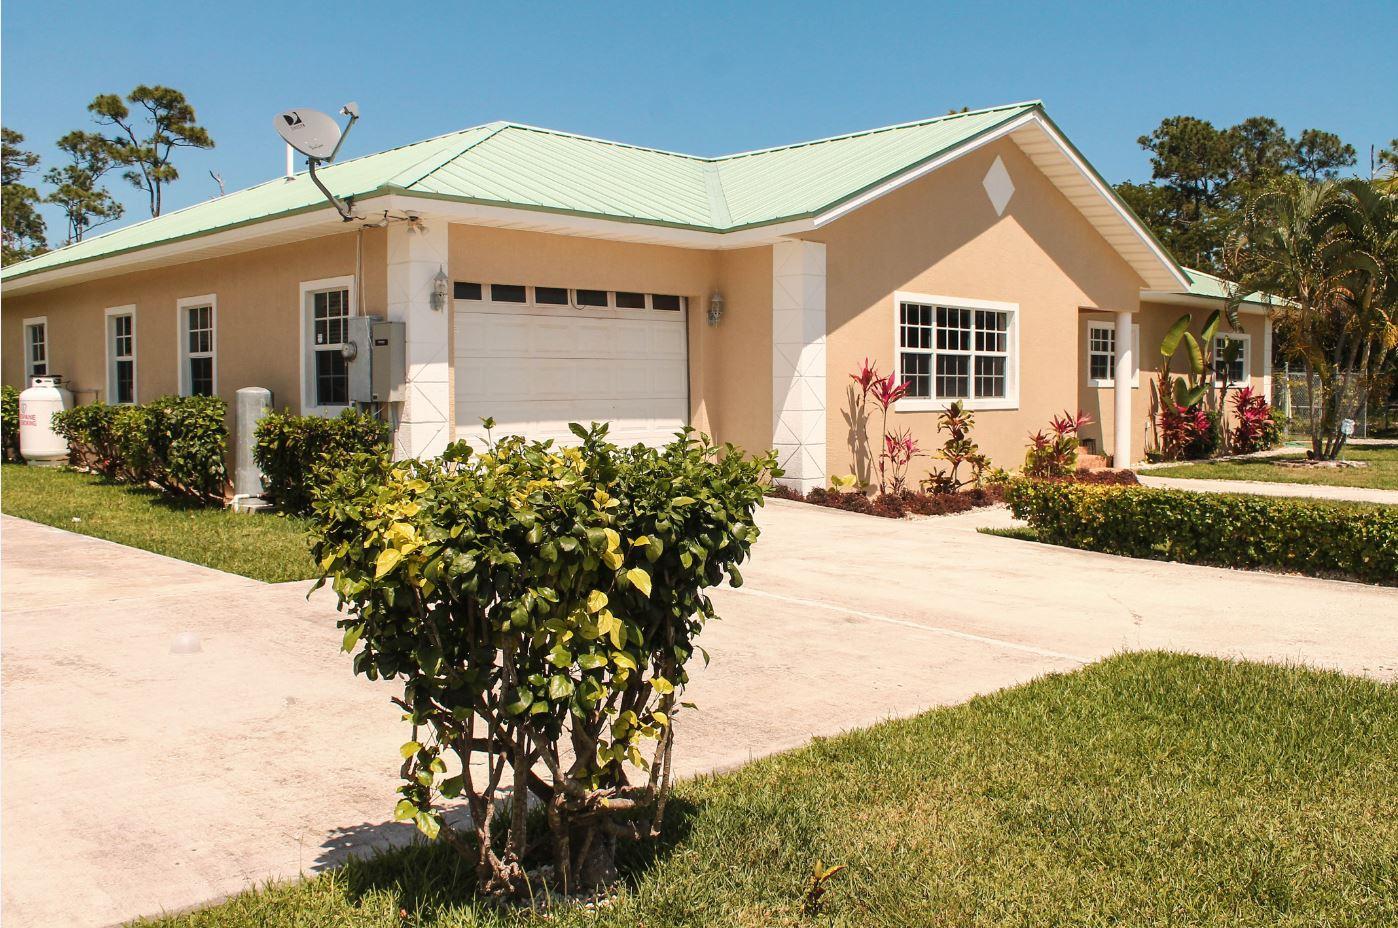 Beautiful Home on Canary Avenue, Grand Bahama/Freeport,